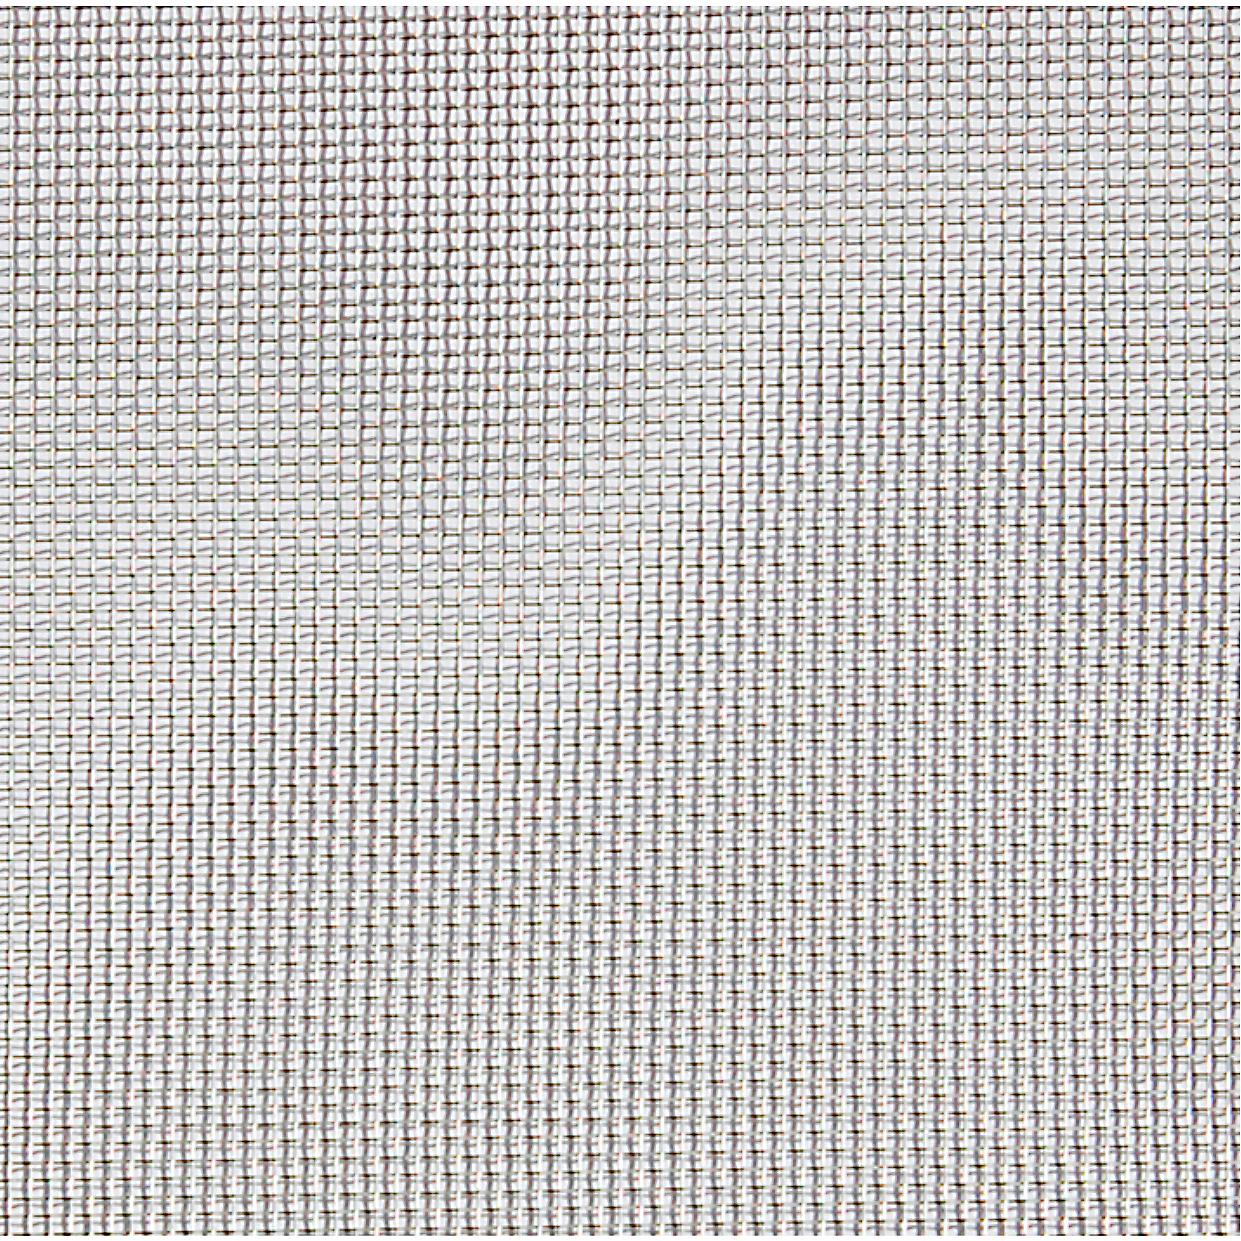 Aluminiumgewebe 18x14.009  SILBER